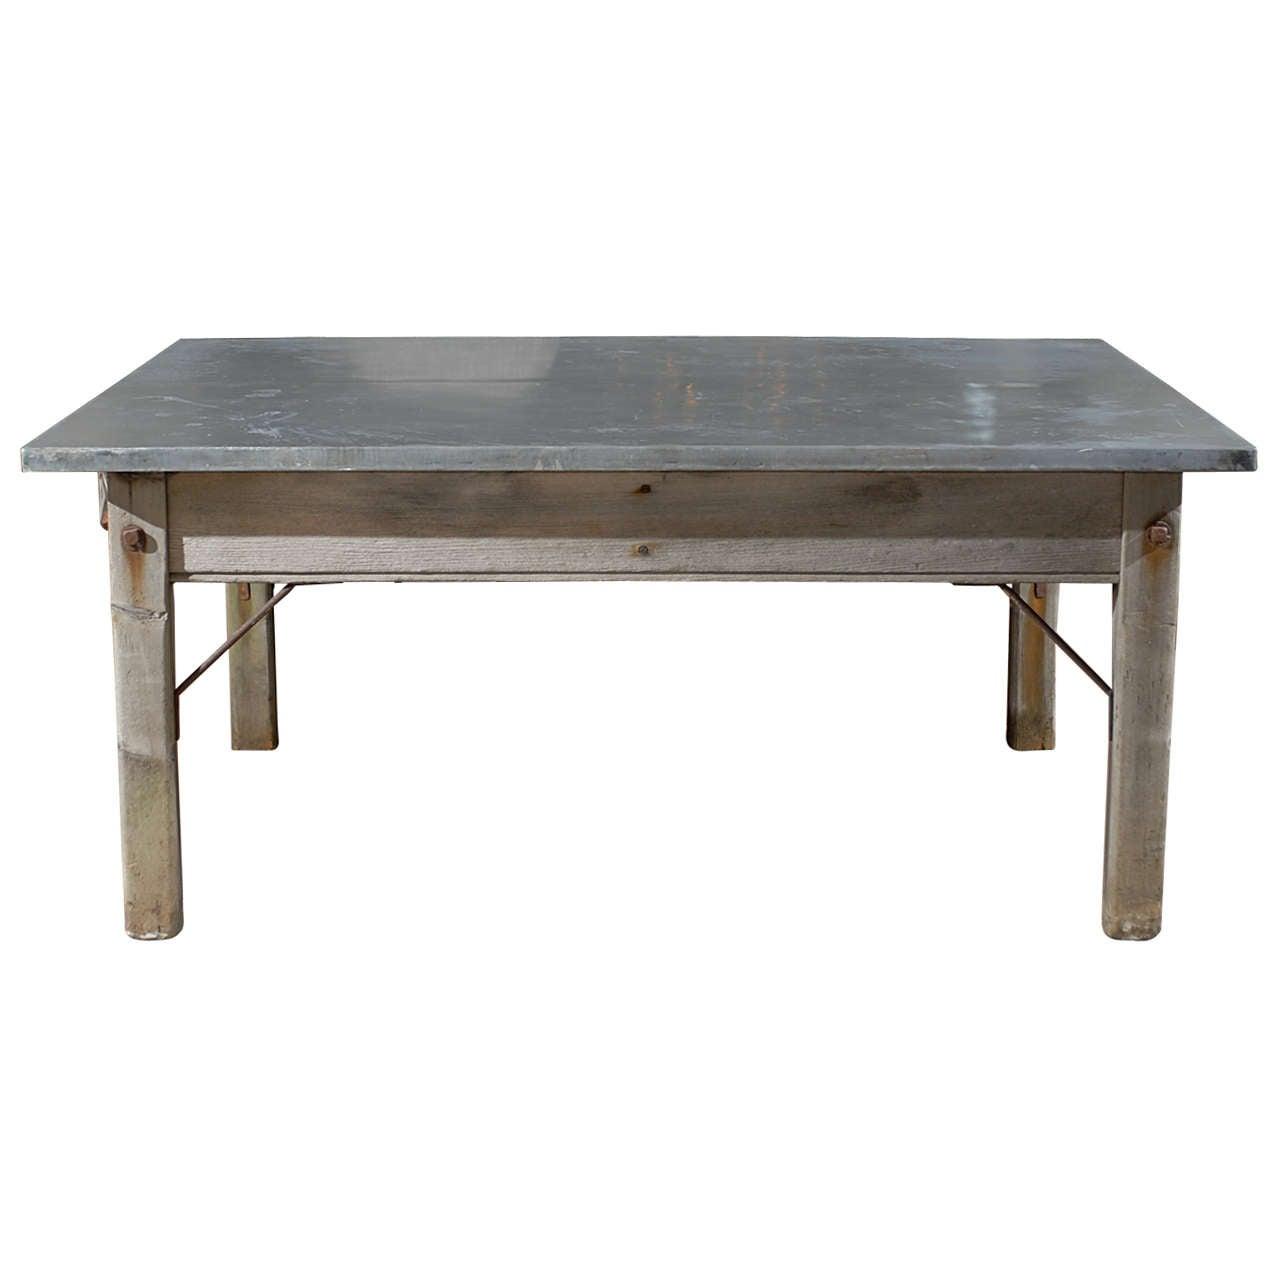 Zinc Top Table At 1stdibs